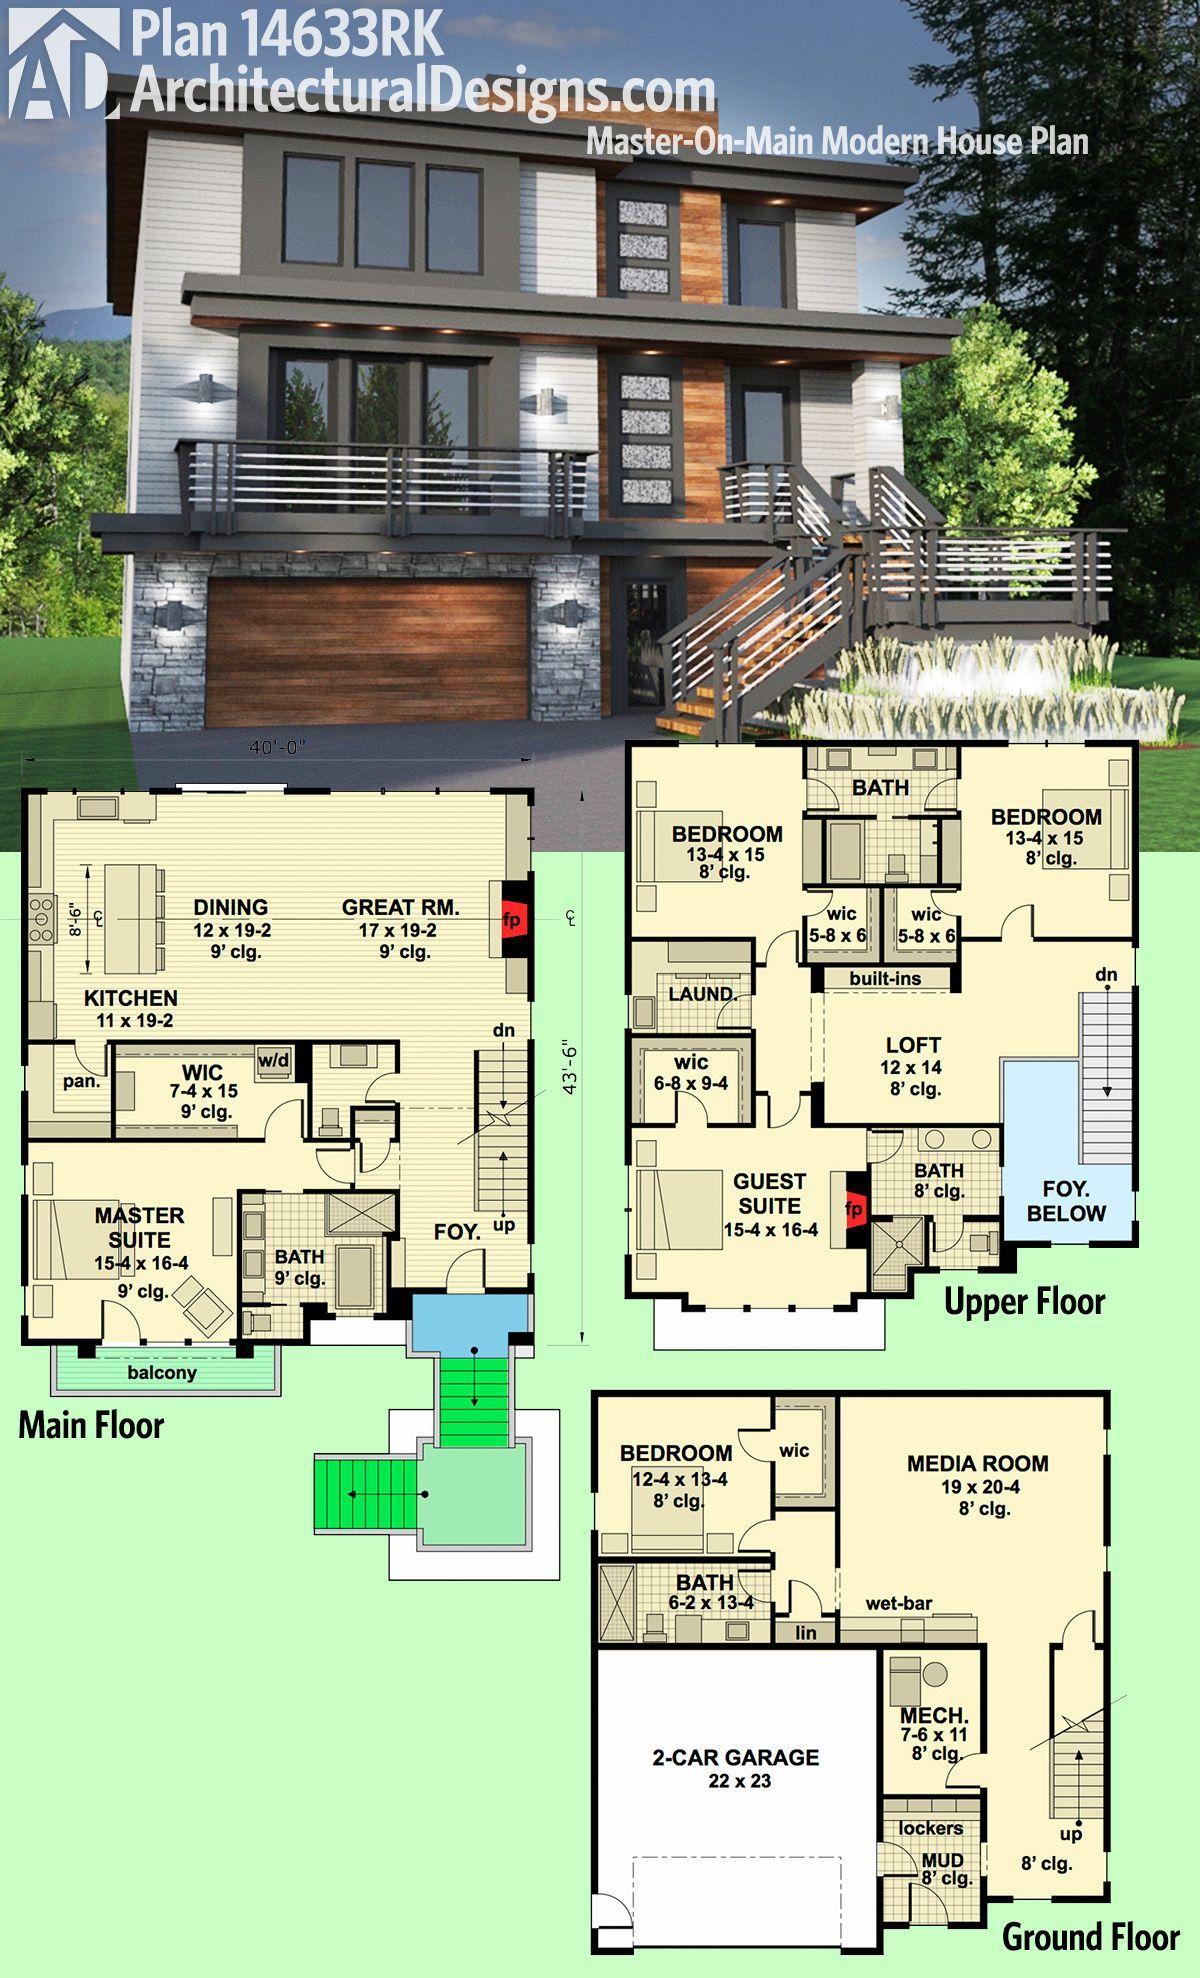 Plan 14633rk Master On Main Modern House Plan House Blueprints House Plans Modern House Plan